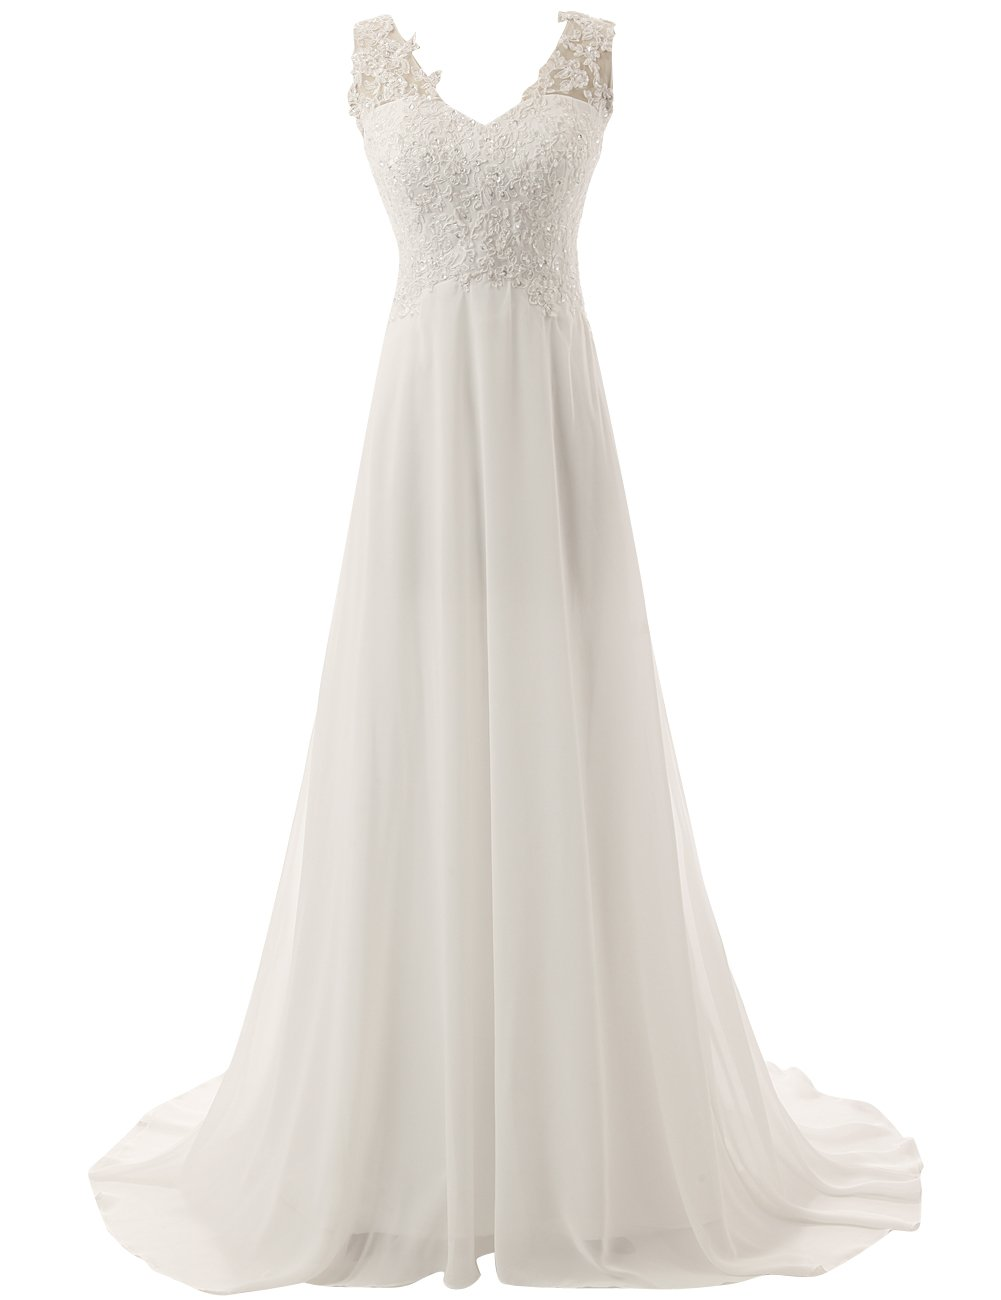 JAEDEN Elegant Lace Beach Wedding Dresses Chiffon V Neck A Line Long Bridal Gown White US22W